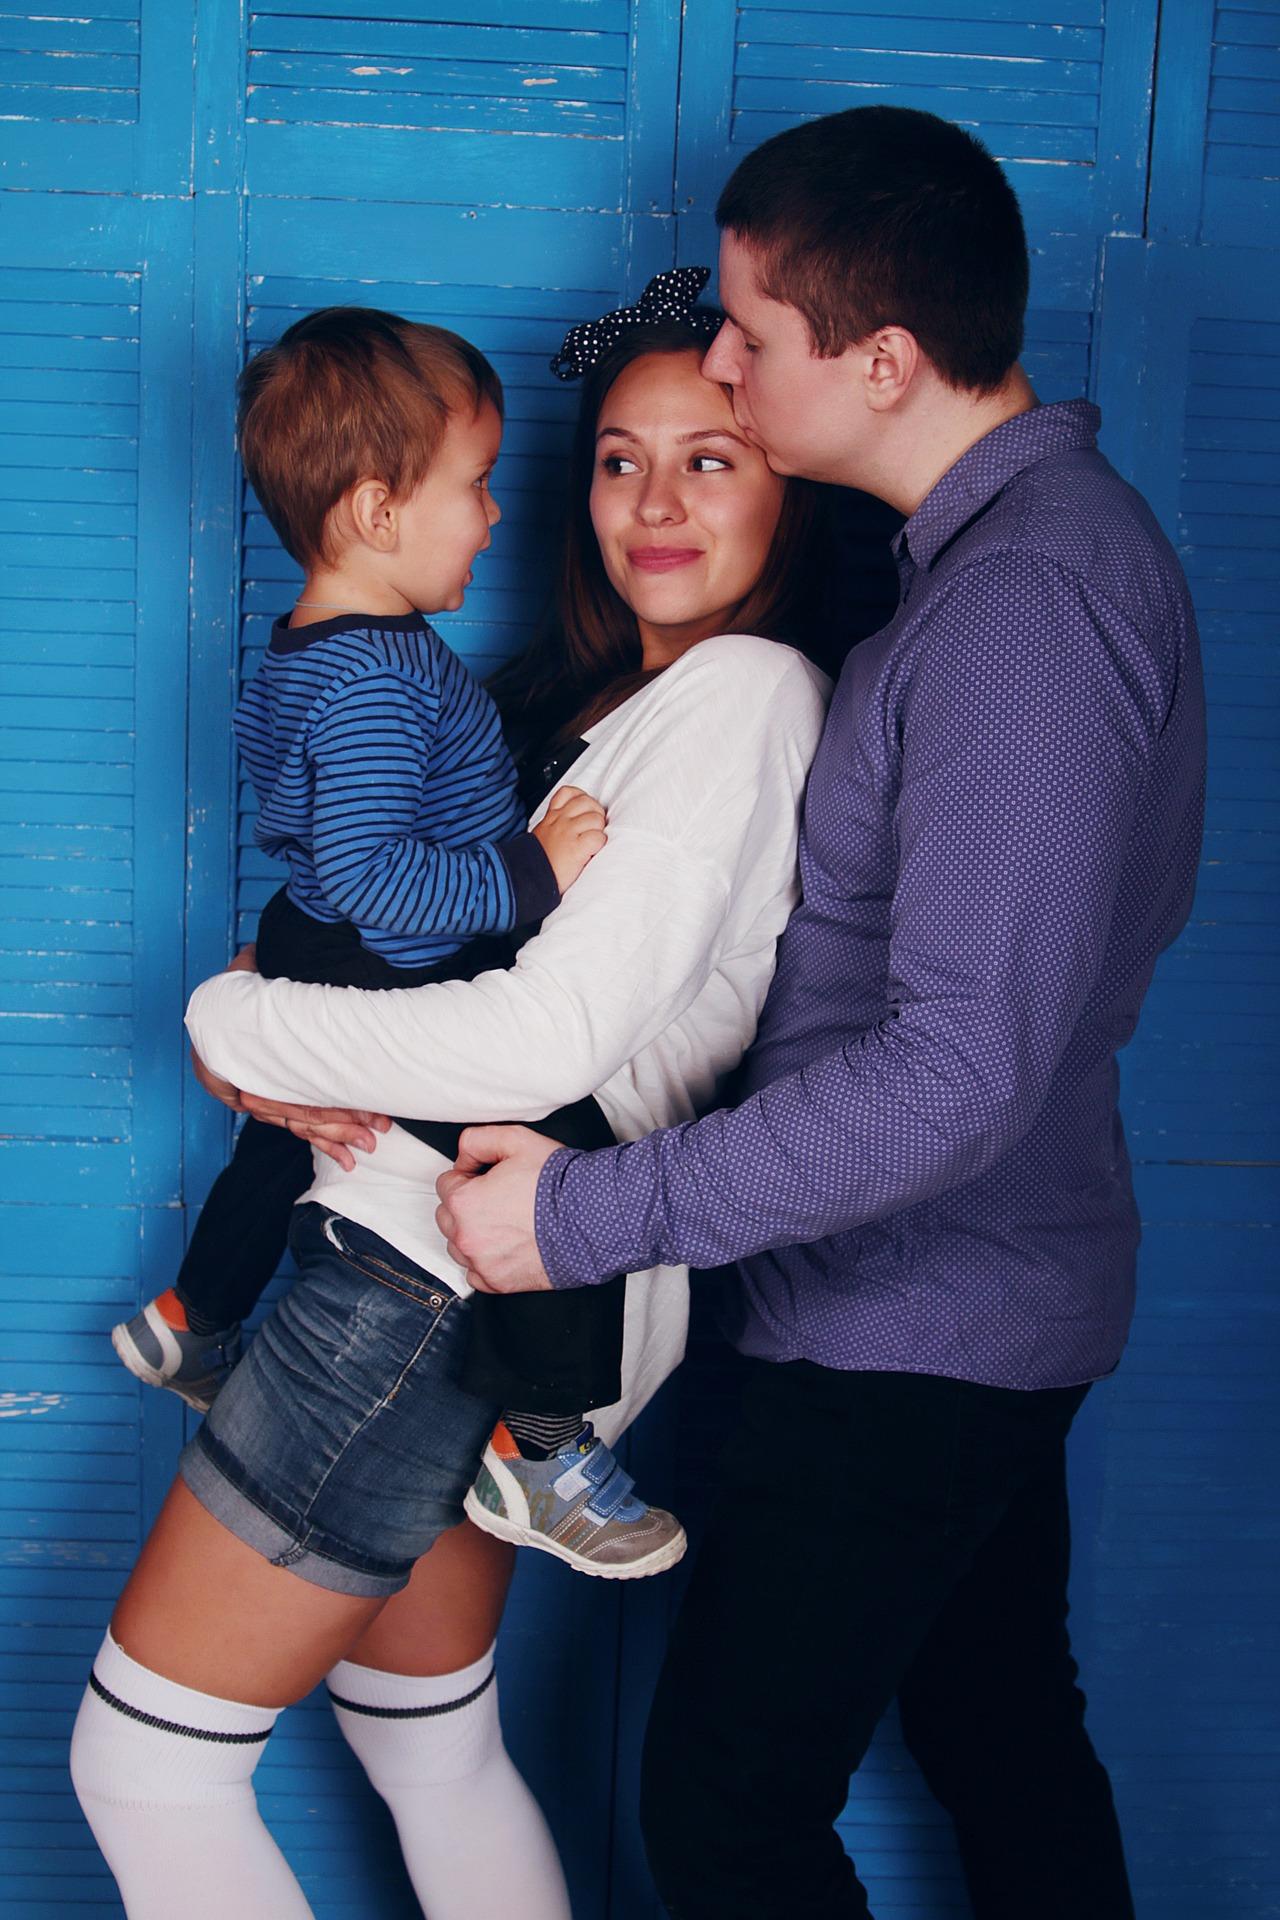 family-1404826_1920